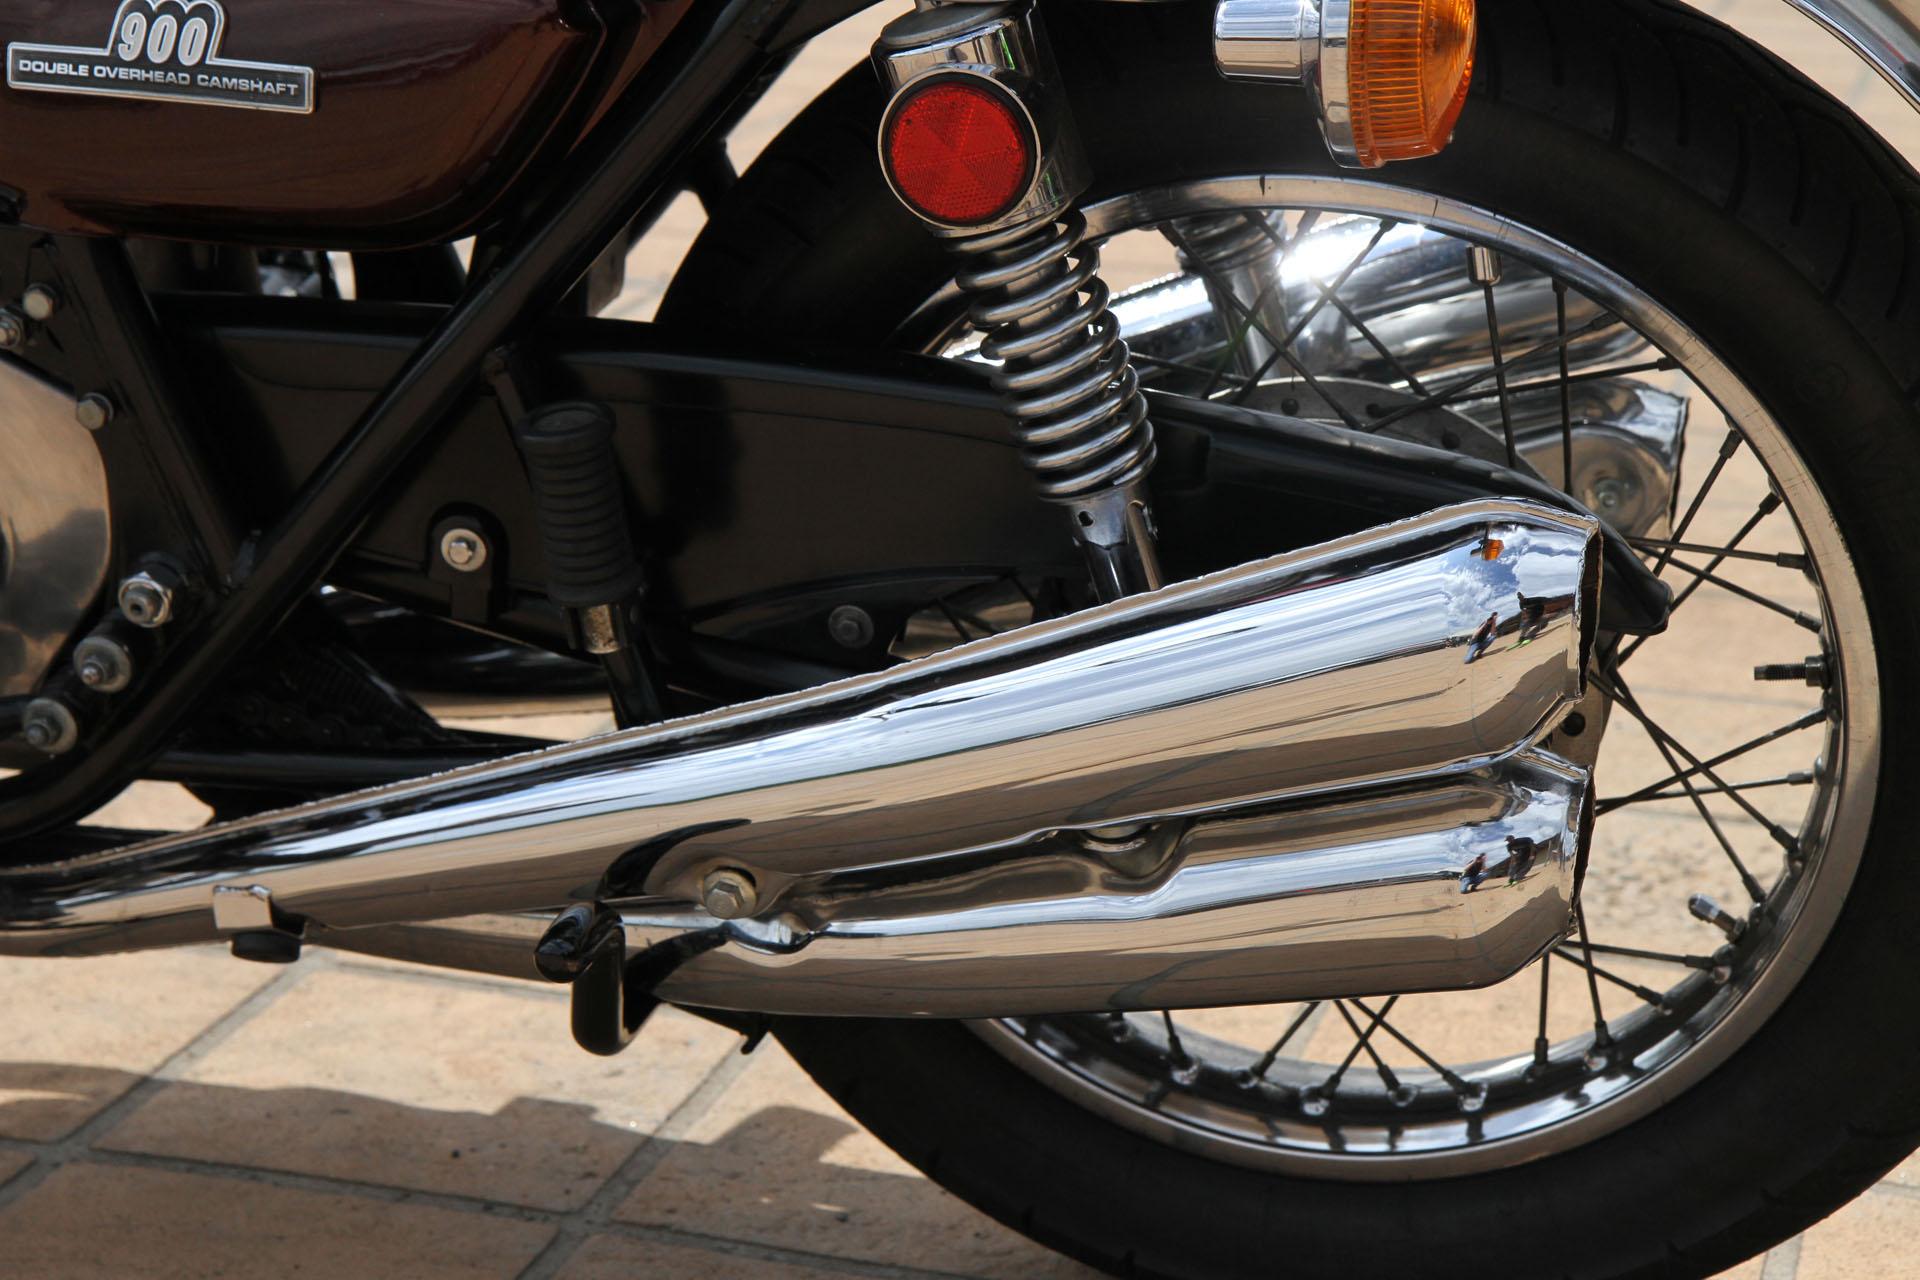 History Kawasaki Legend Z1 900 New York Steak Bike Review Engine Diagram Bikereview Z9 Jaffa 9